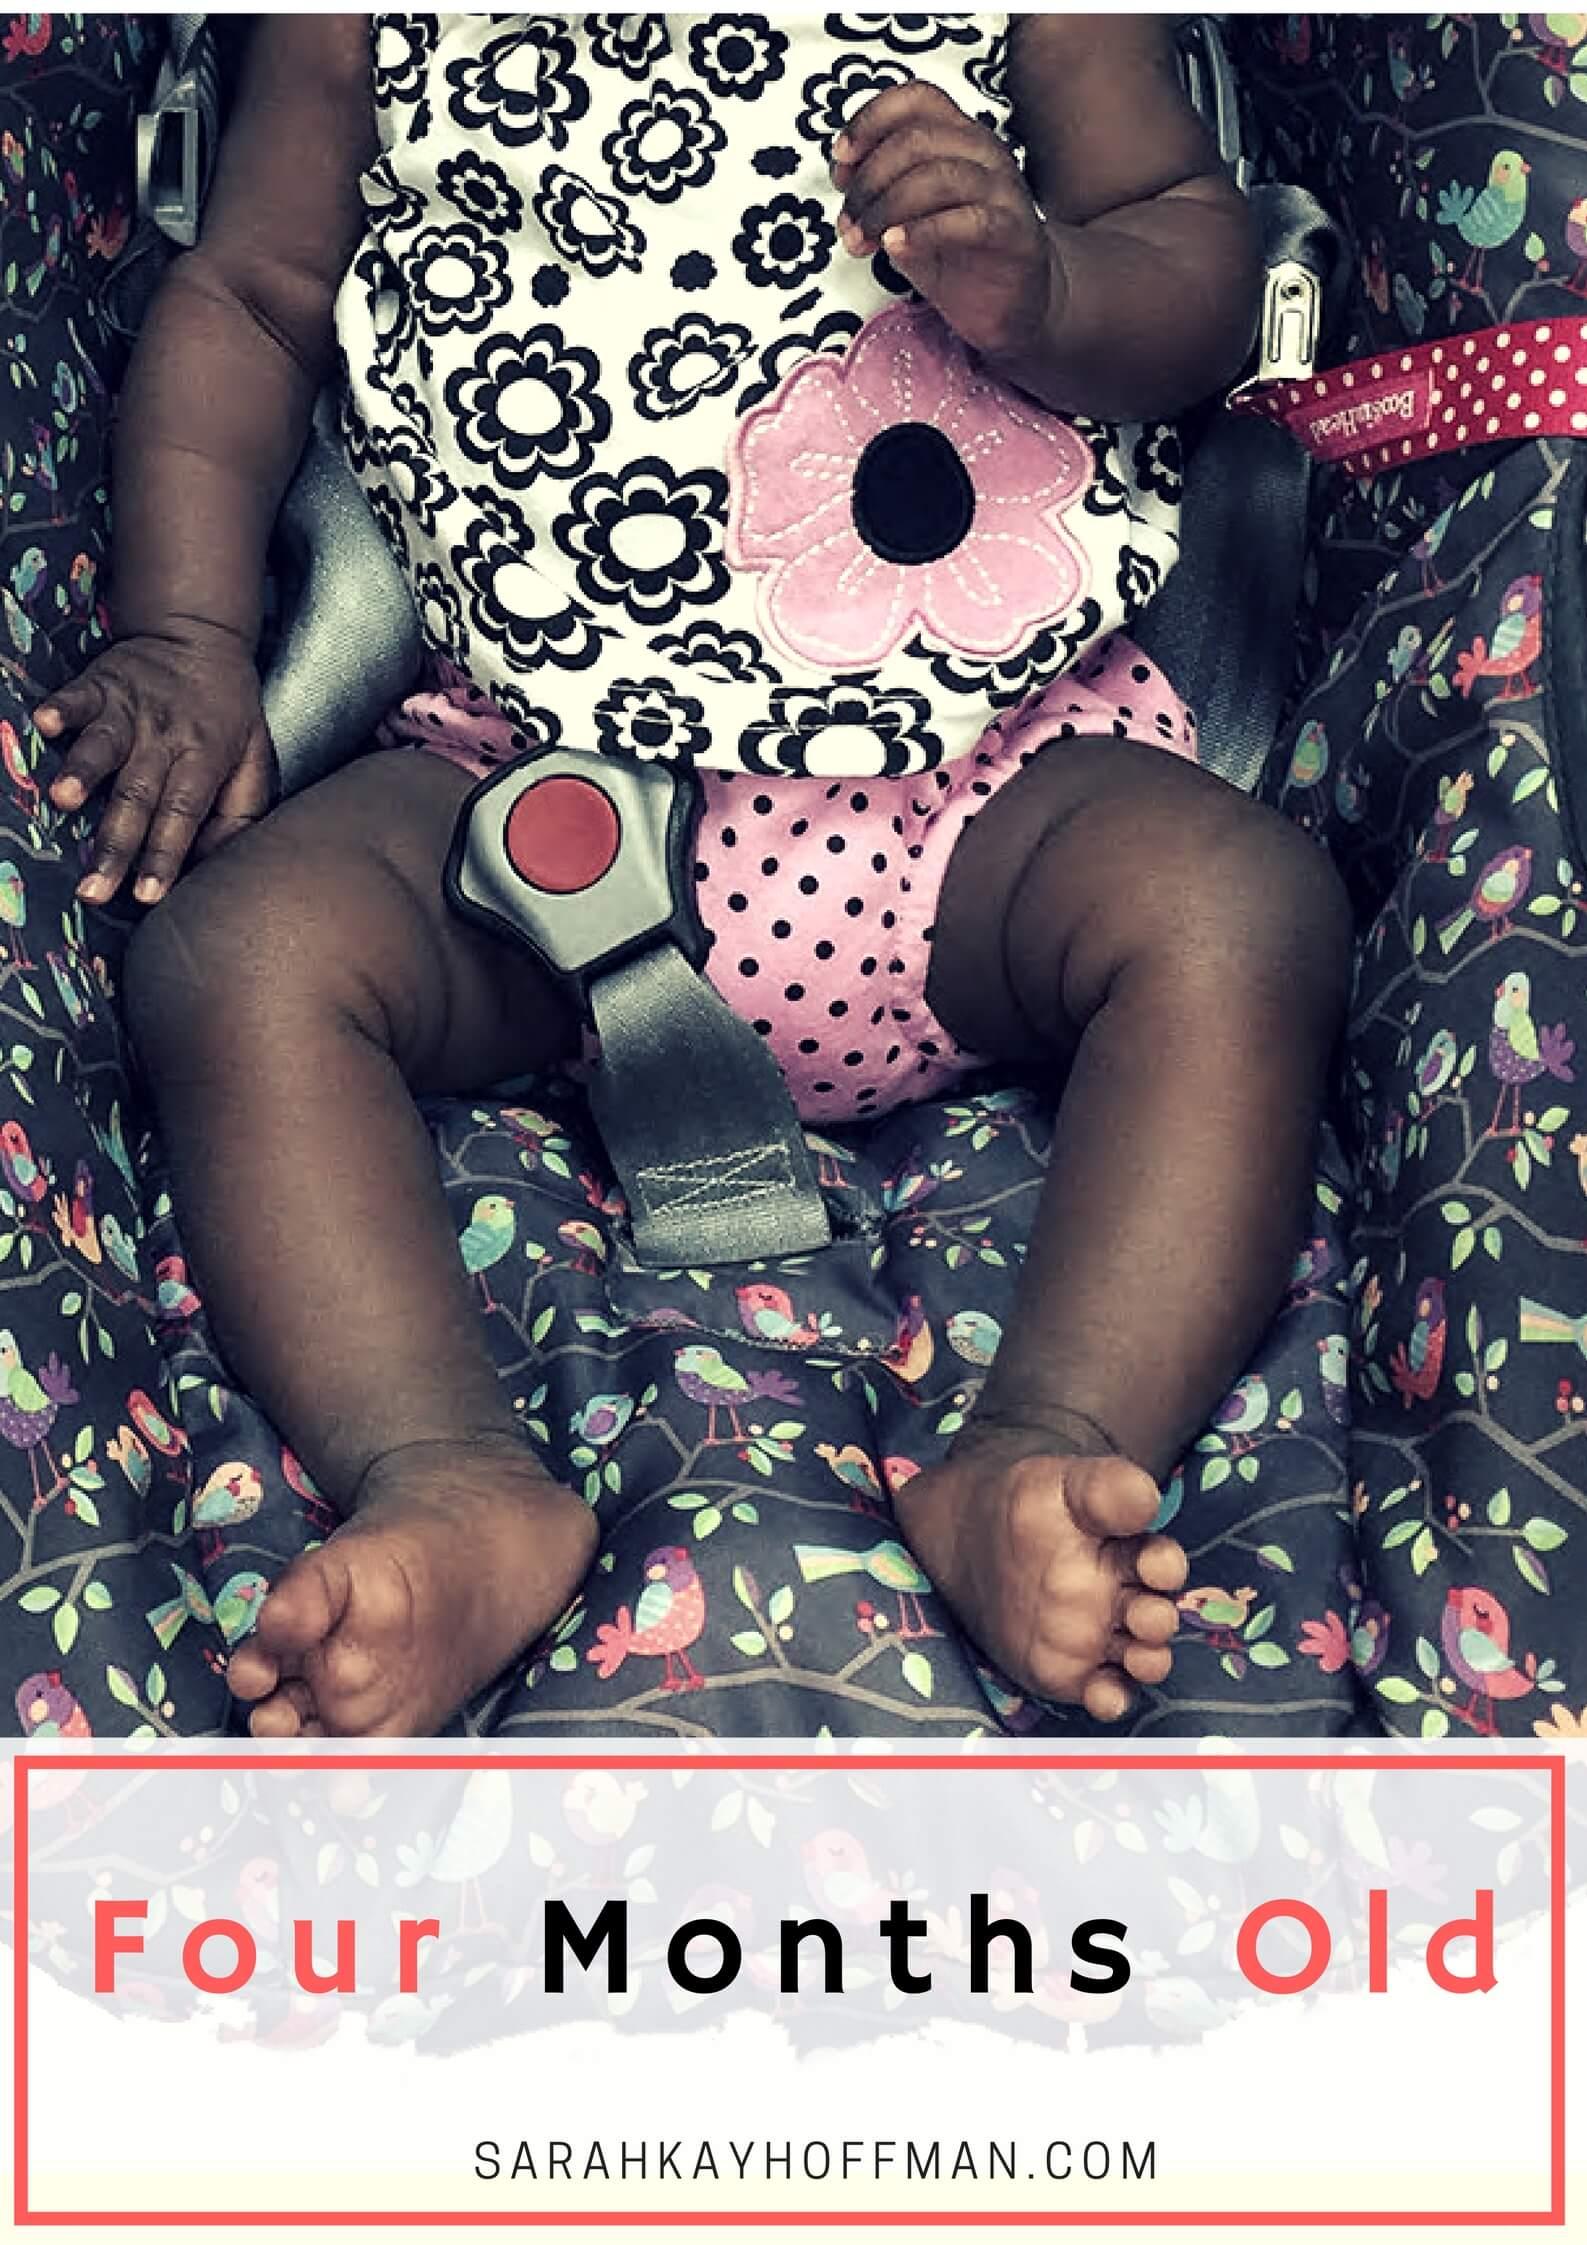 Four Months Old sarahkayhoffman.com Foster Adoption Adopt